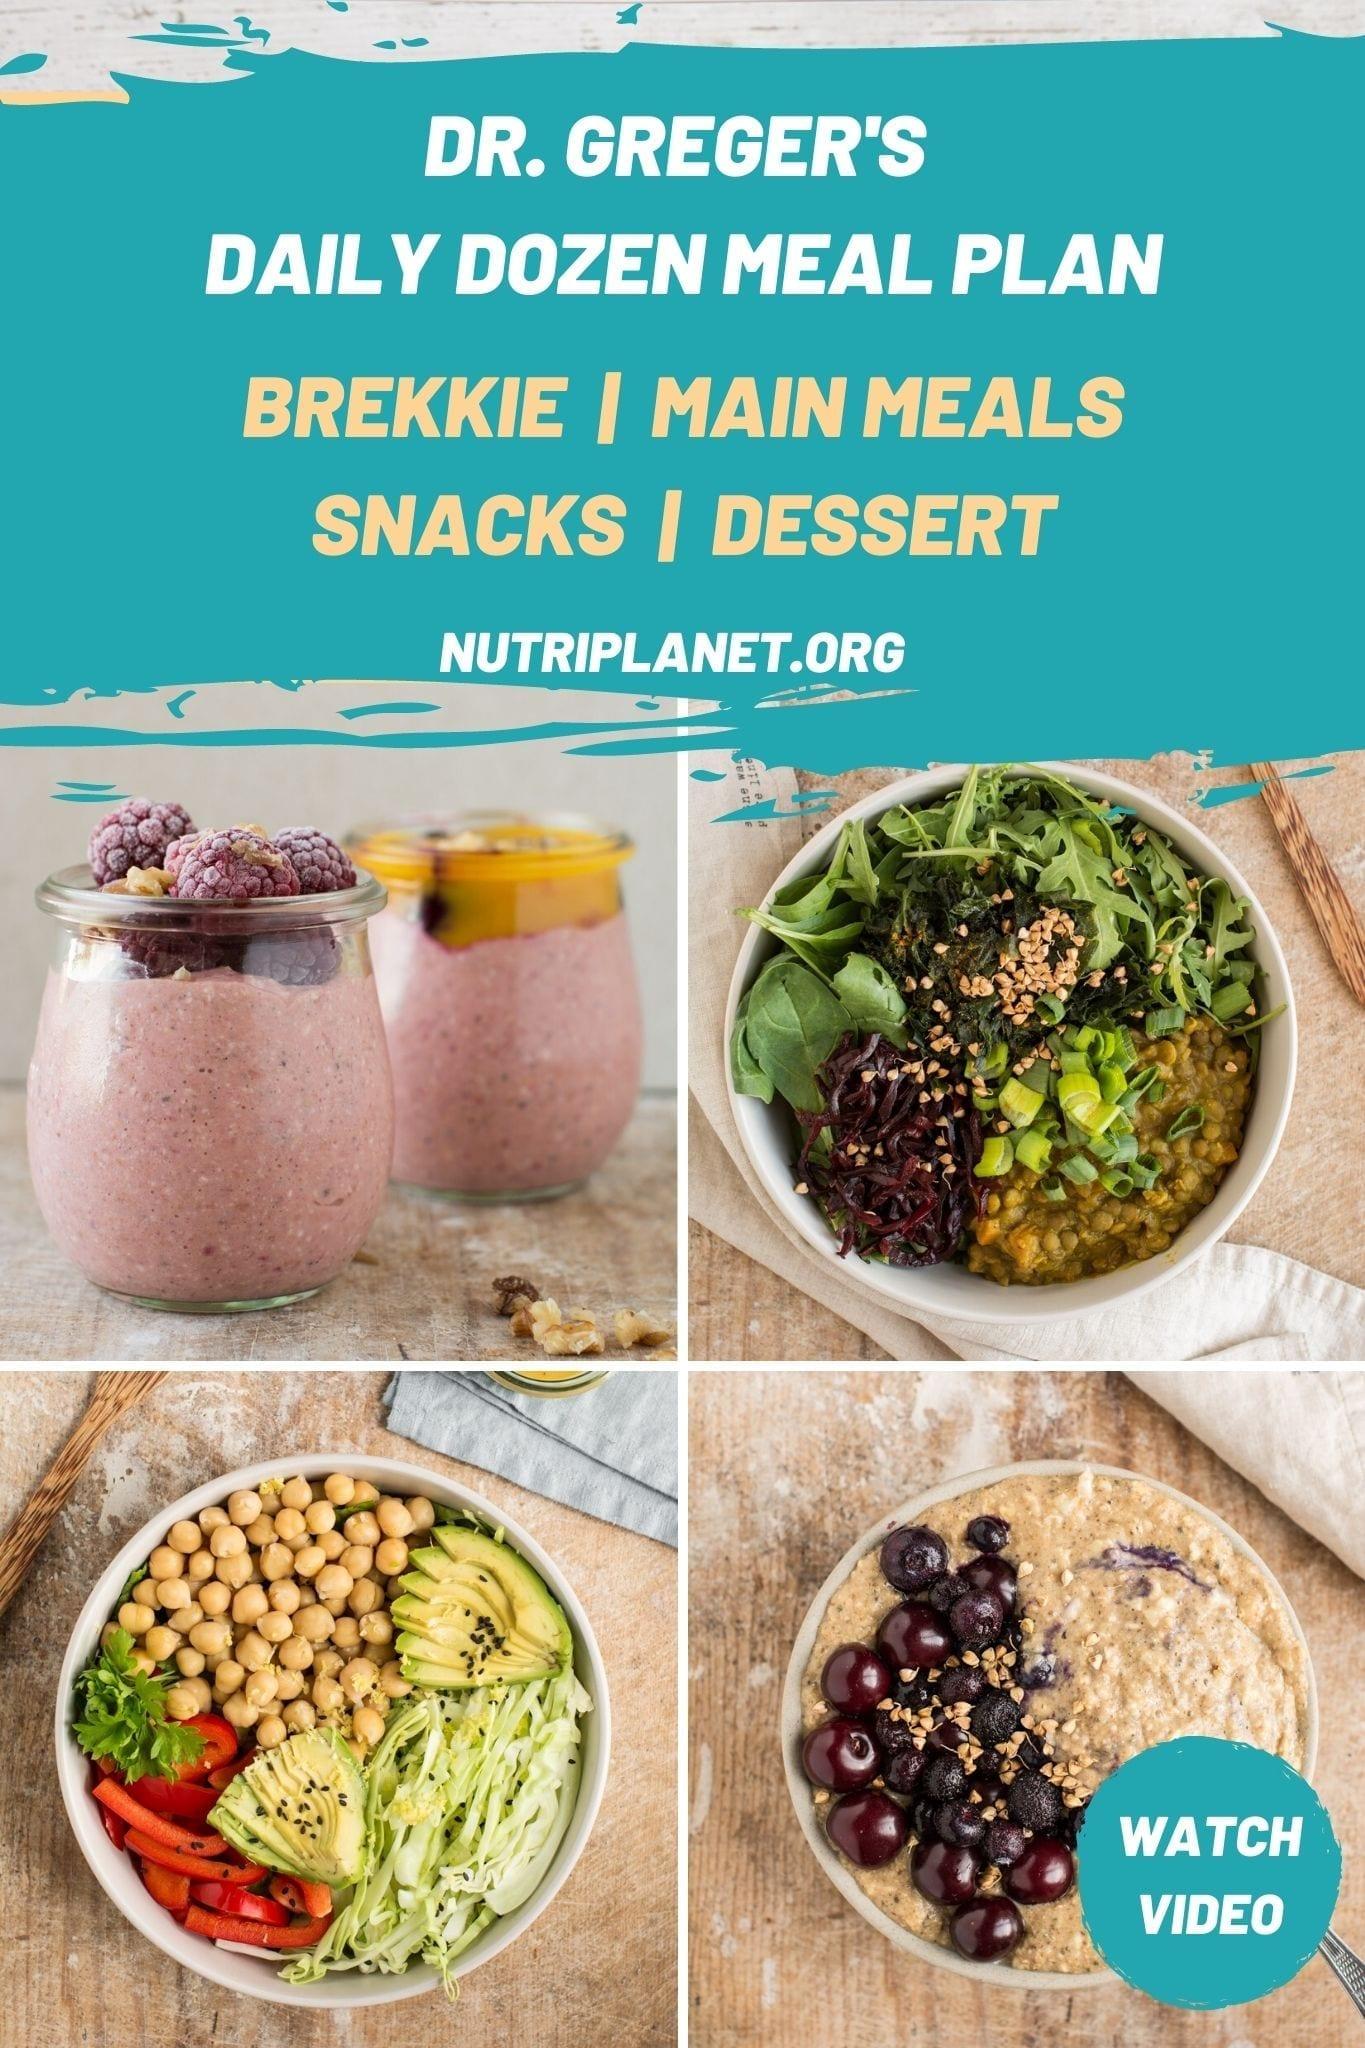 Dr. Greger's Daily Dozen Meal Plan Challenge